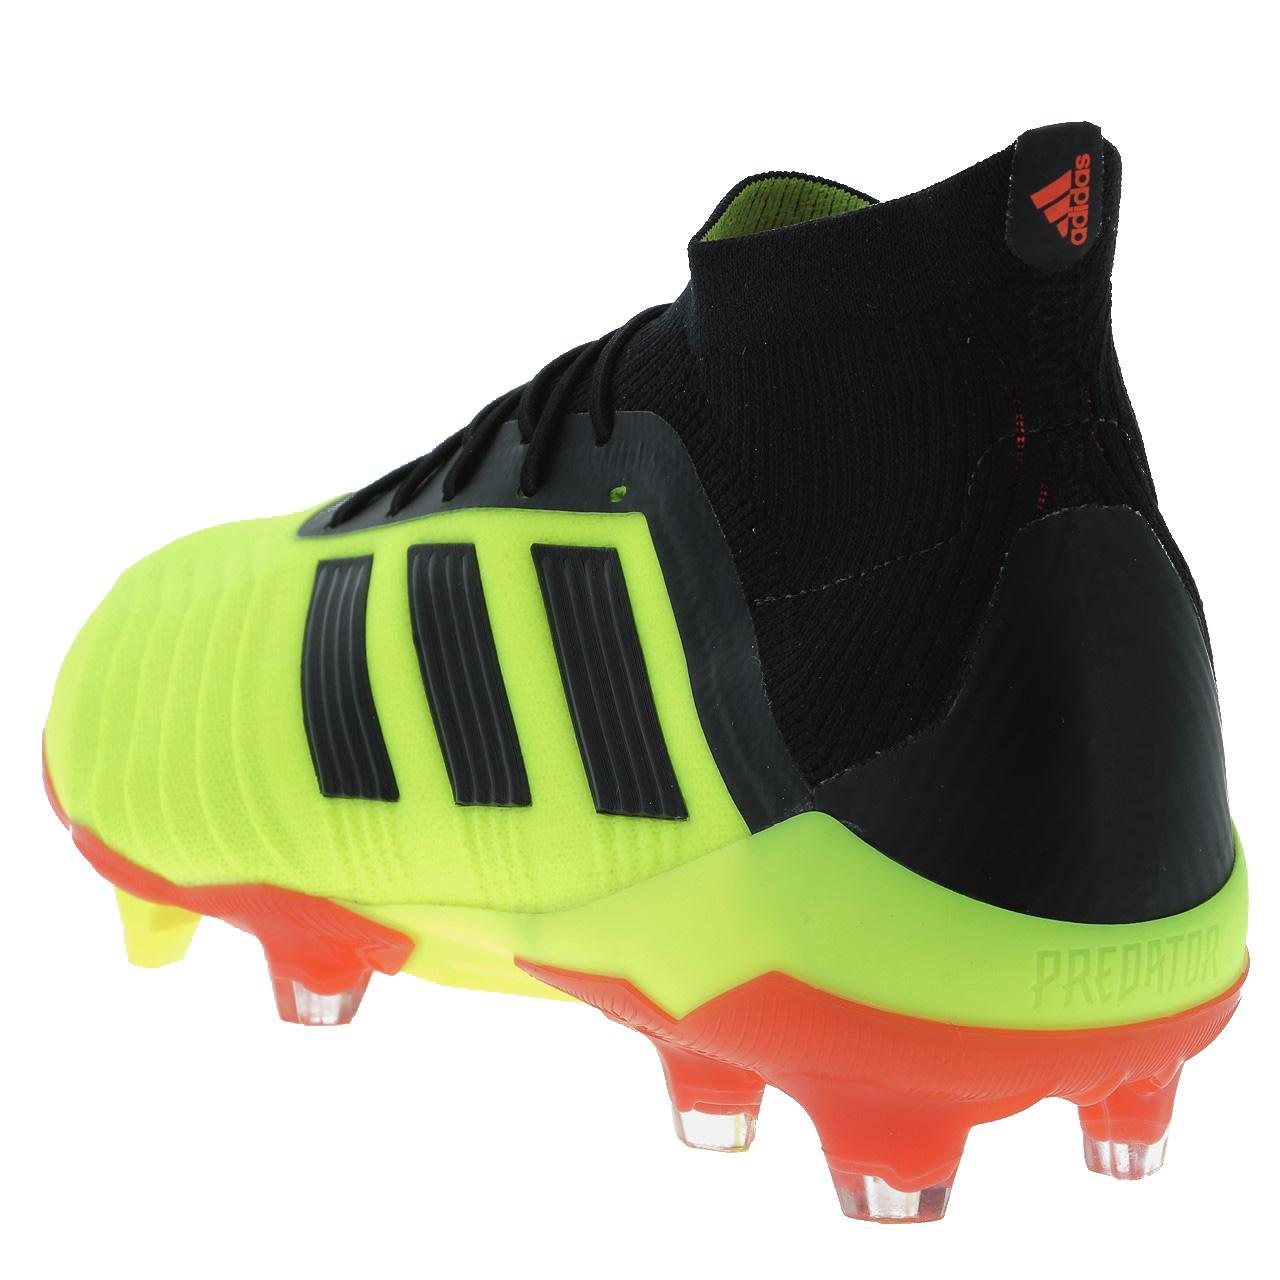 Football-Shoes-Flap-Adidas-Predator-18-1-Fg-Syello-Yellow-47849-New thumbnail 2